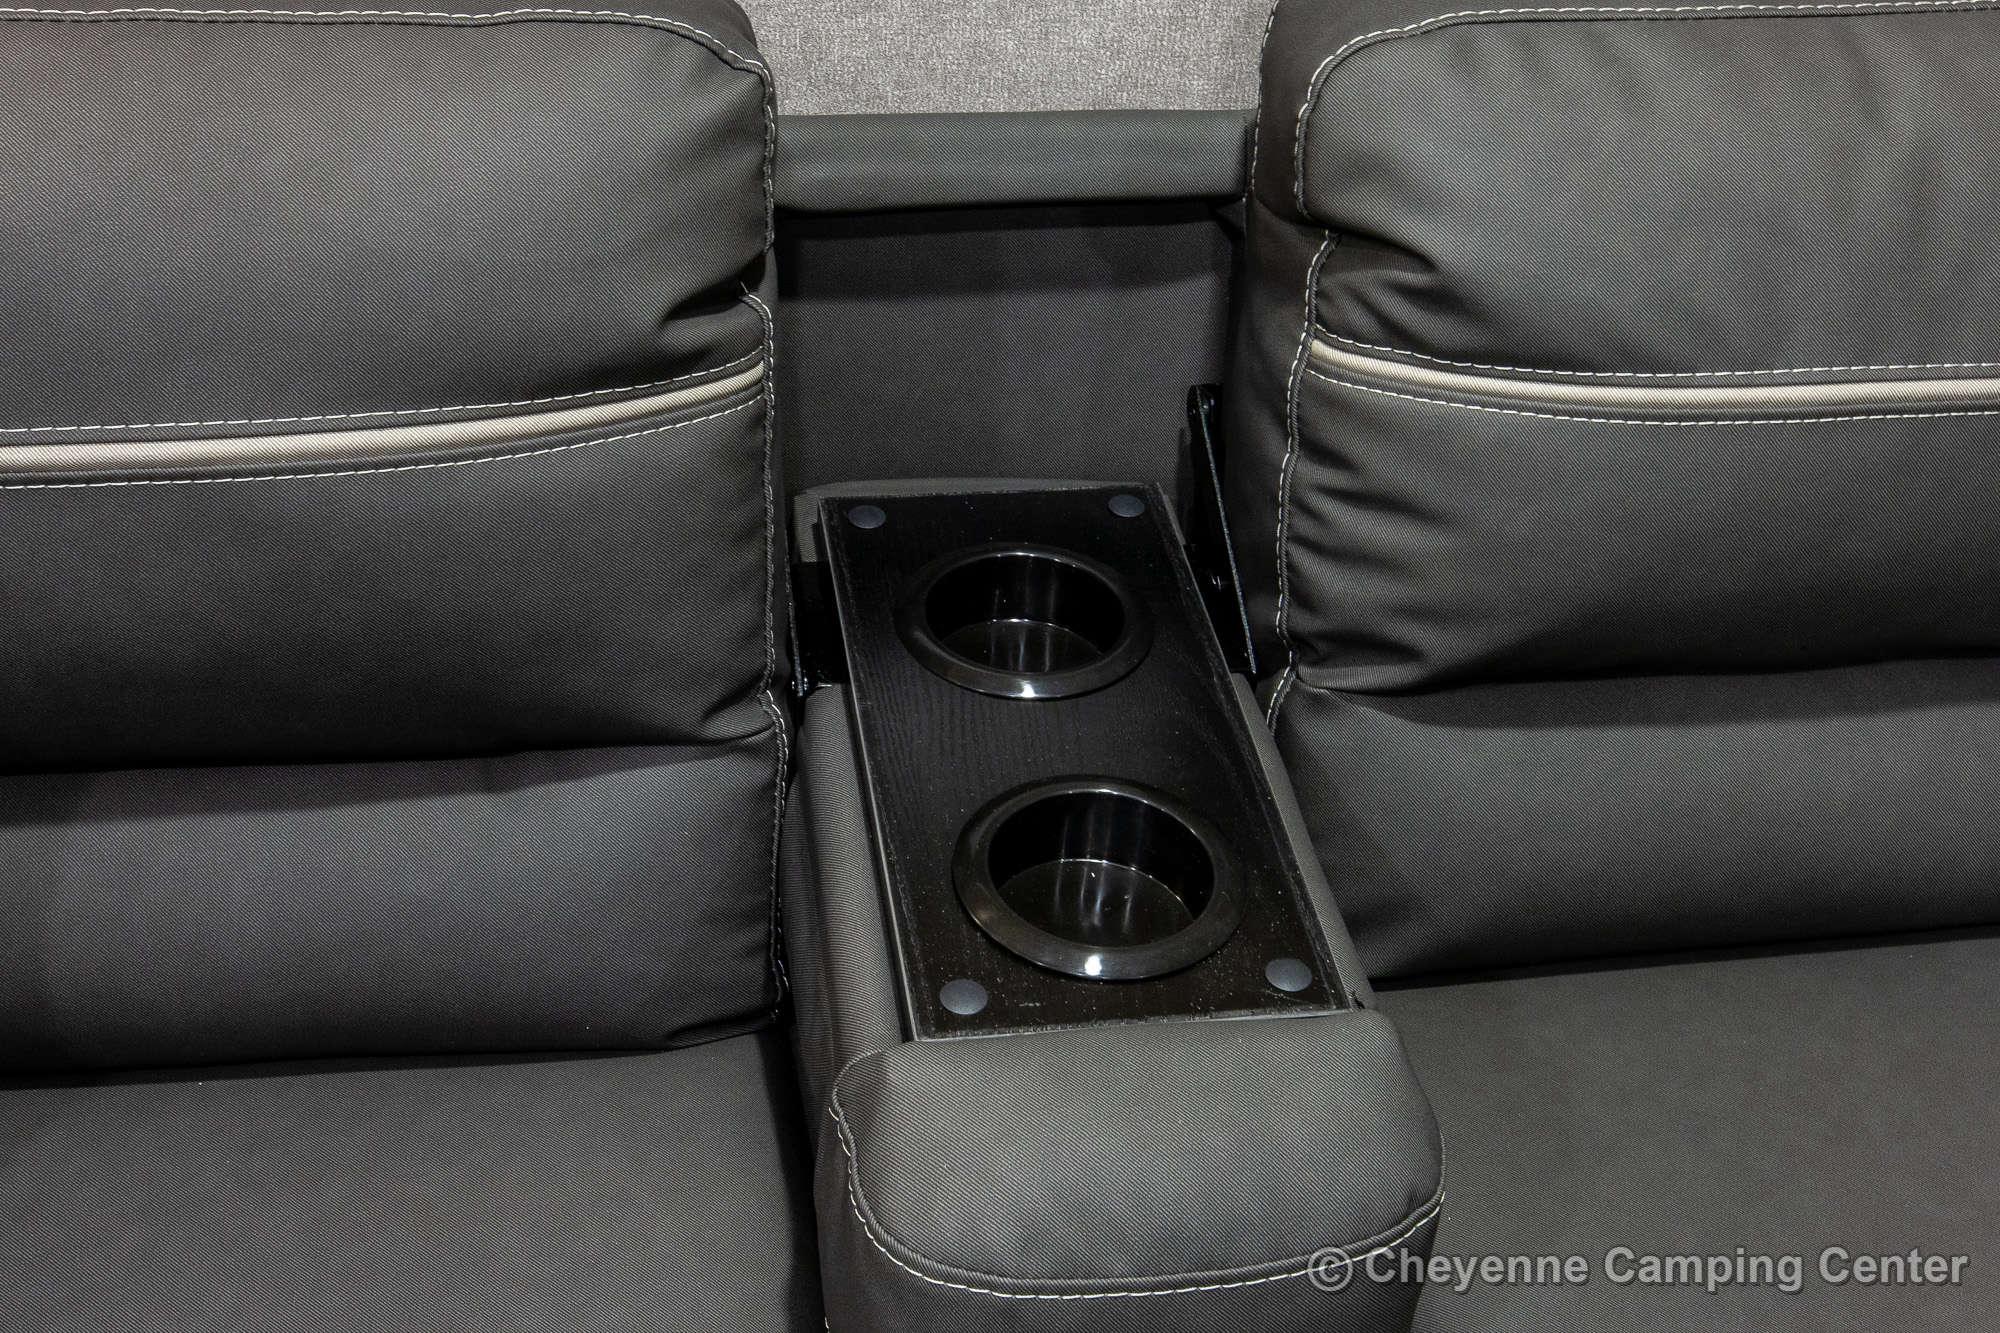 2021 Coachmen Catalina Legacy Edition 243RBS Travel Trailer Interior Image